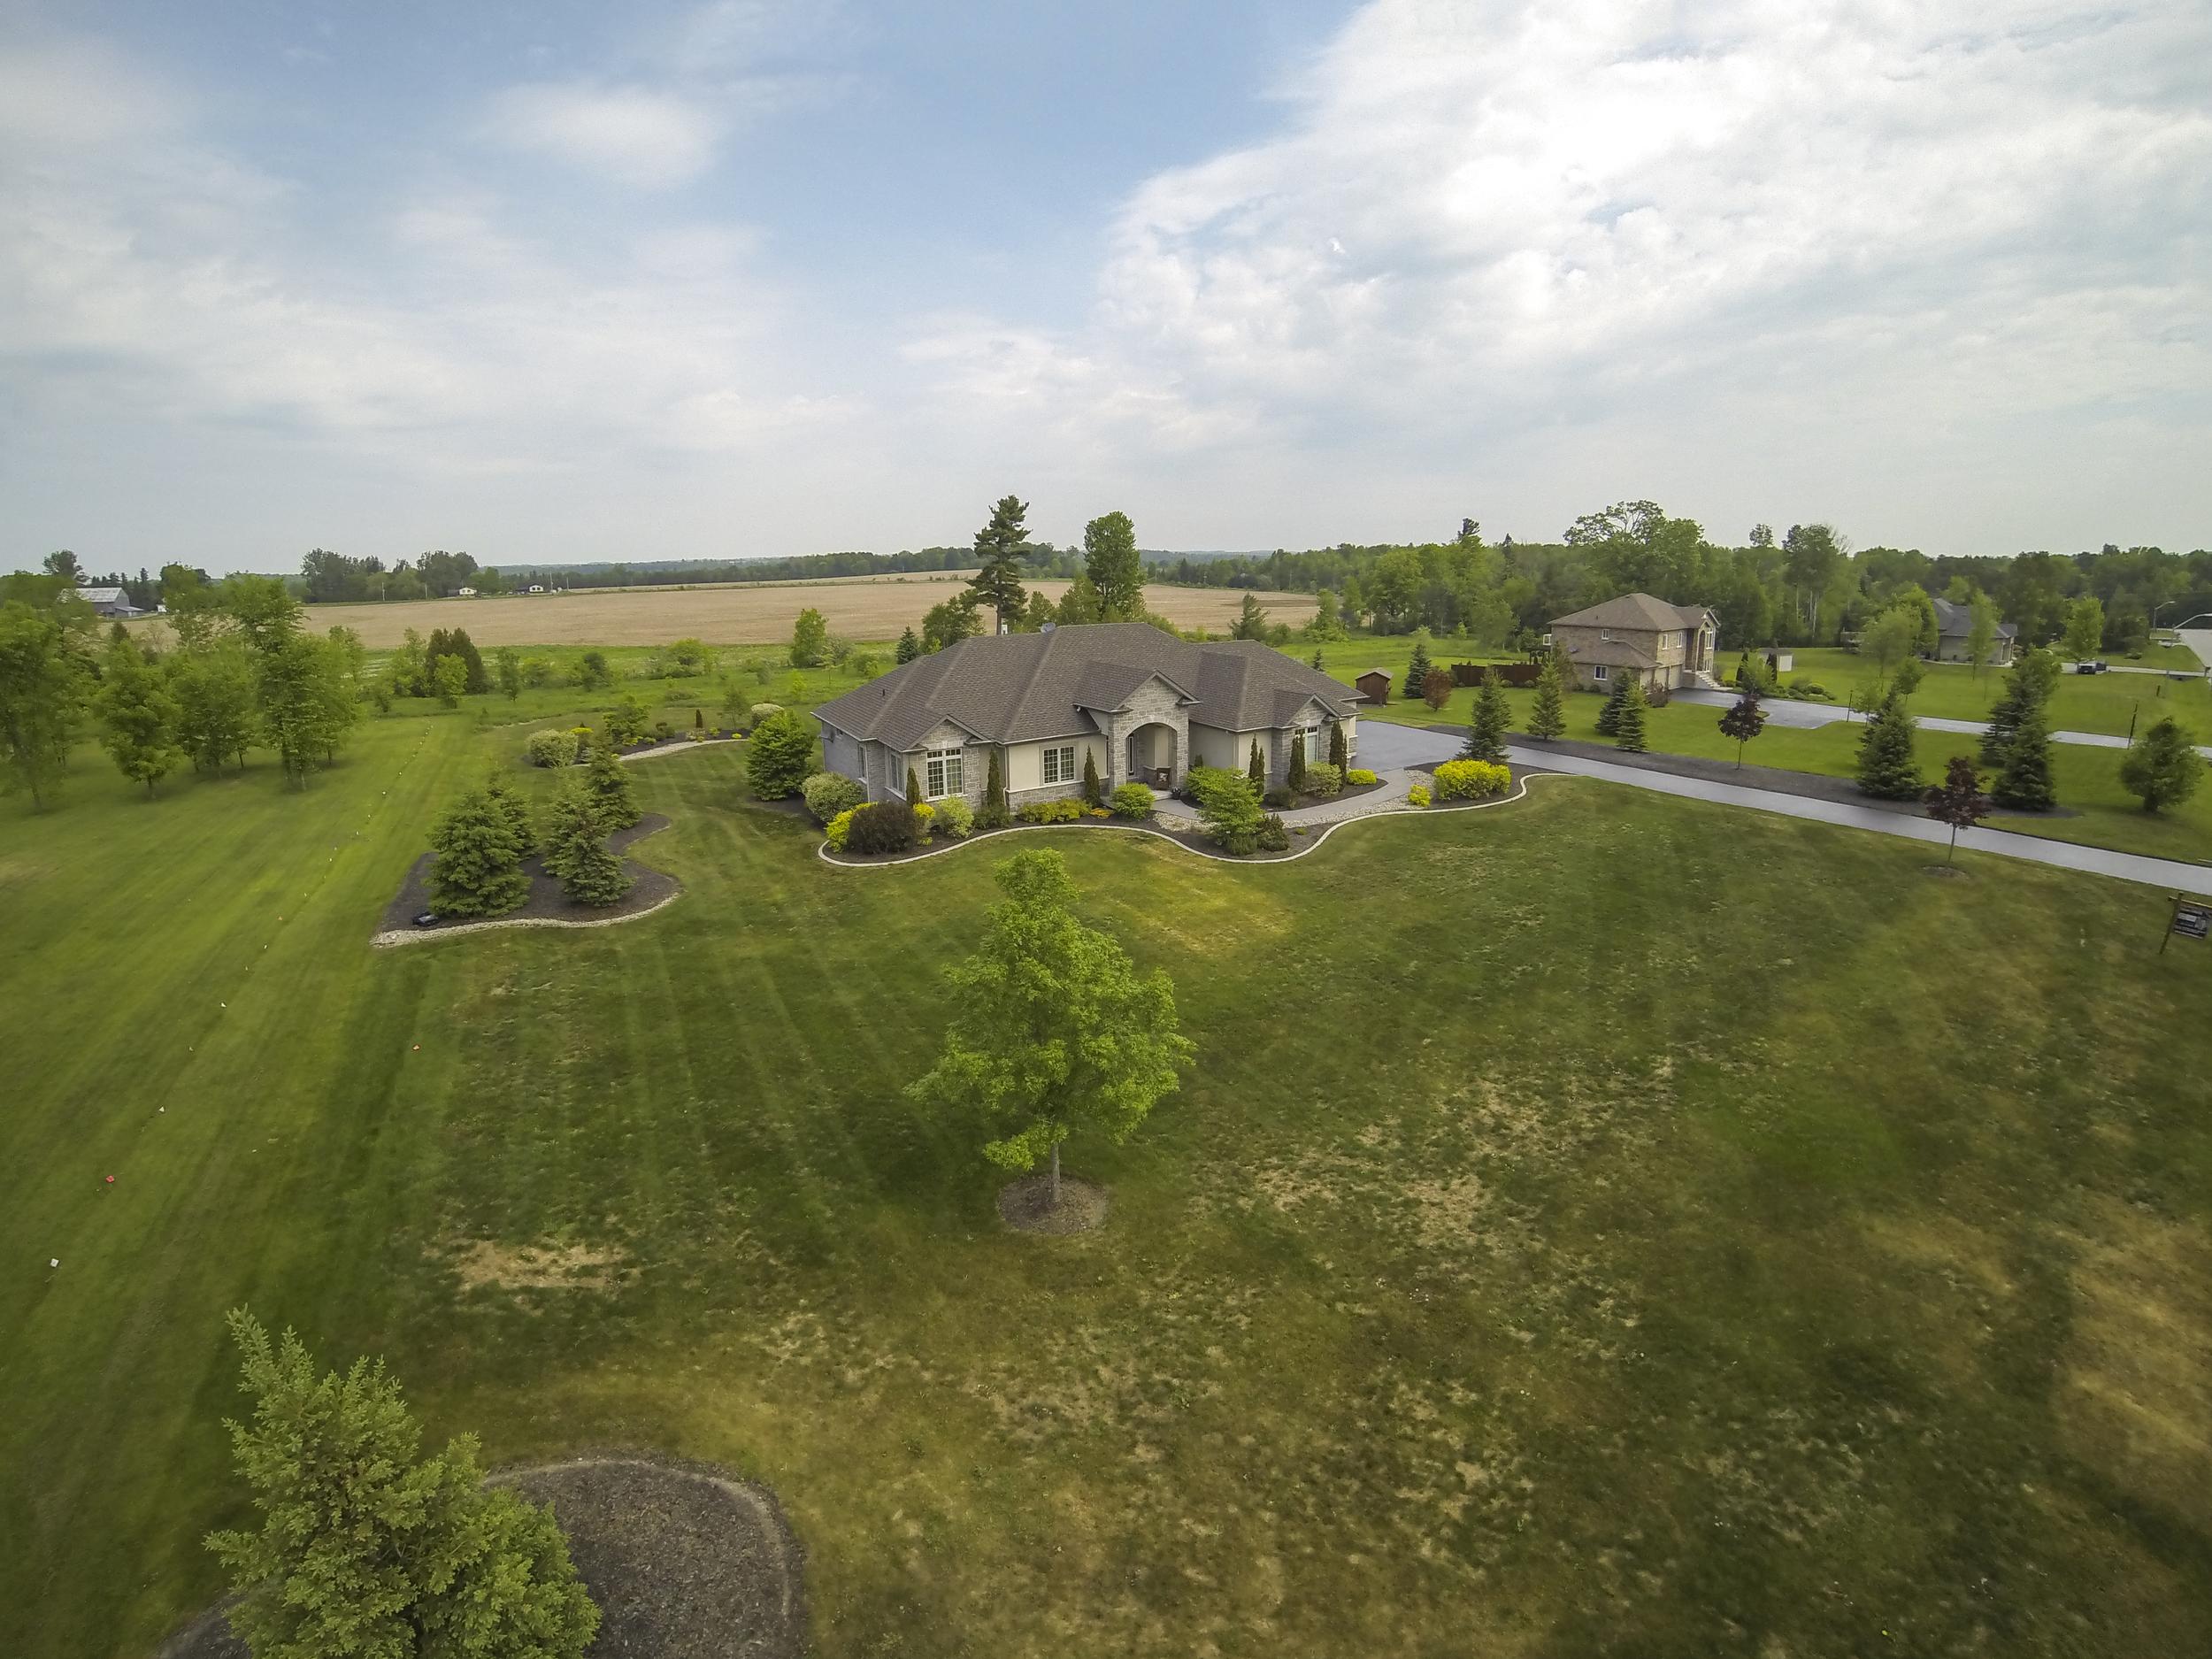 9foresthill_aerial4.jpg